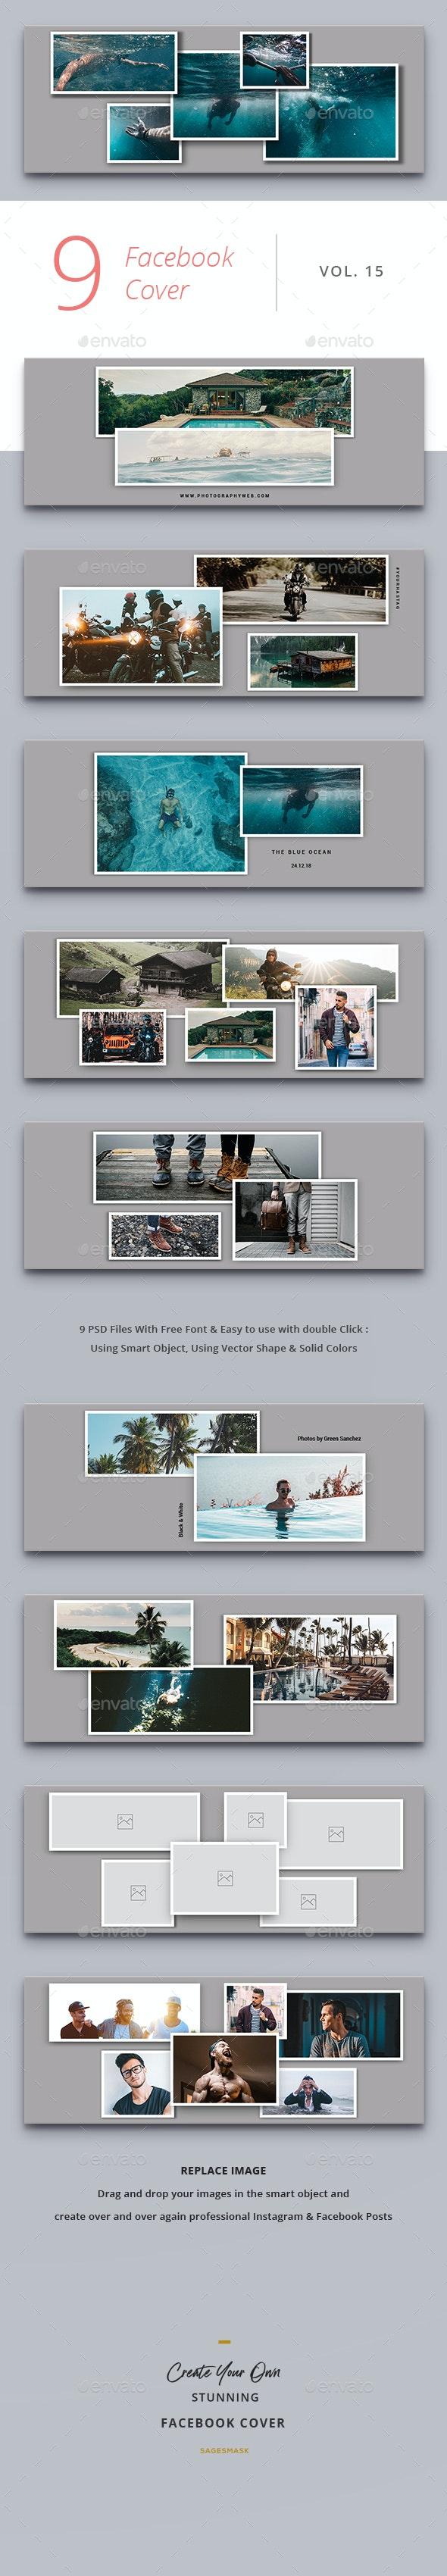 Facebook Cover Vol. 15 - Facebook Timeline Covers Social Media